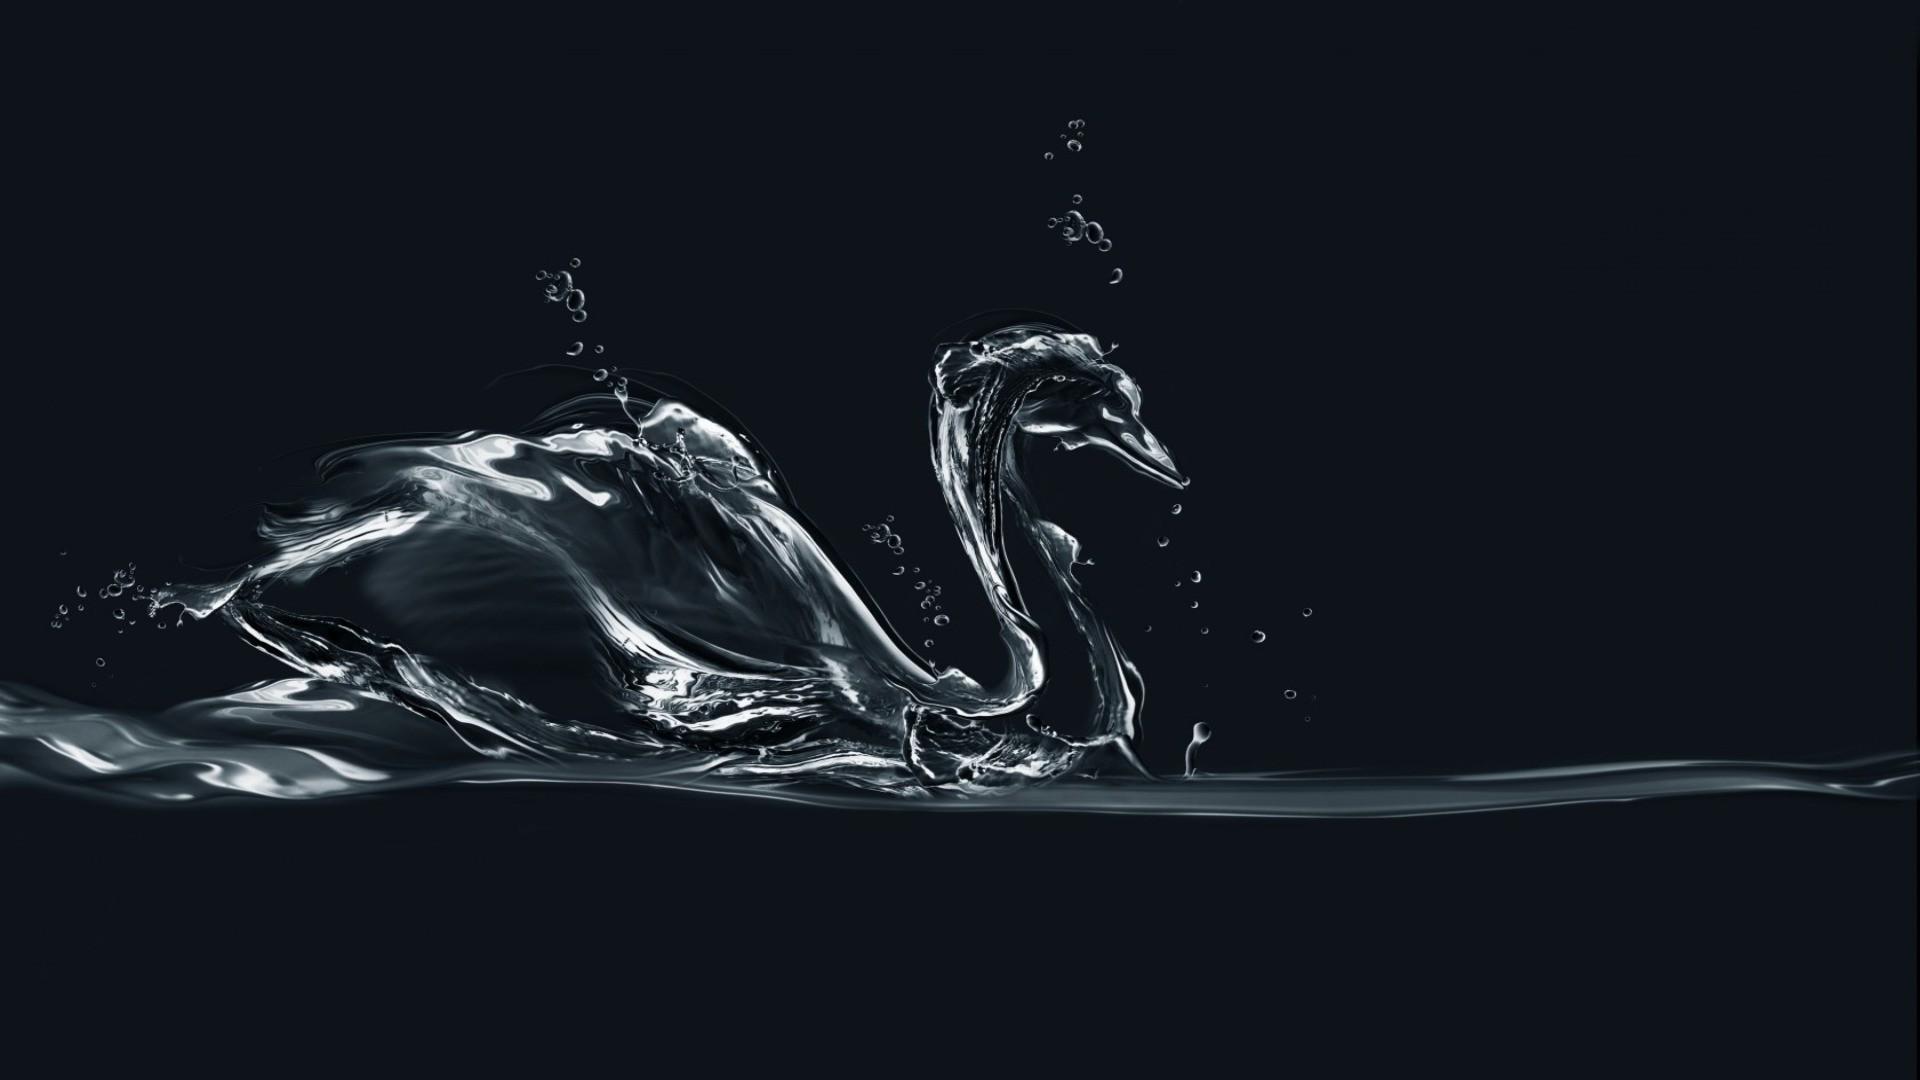 Water Minimalist Wallpaper image hd